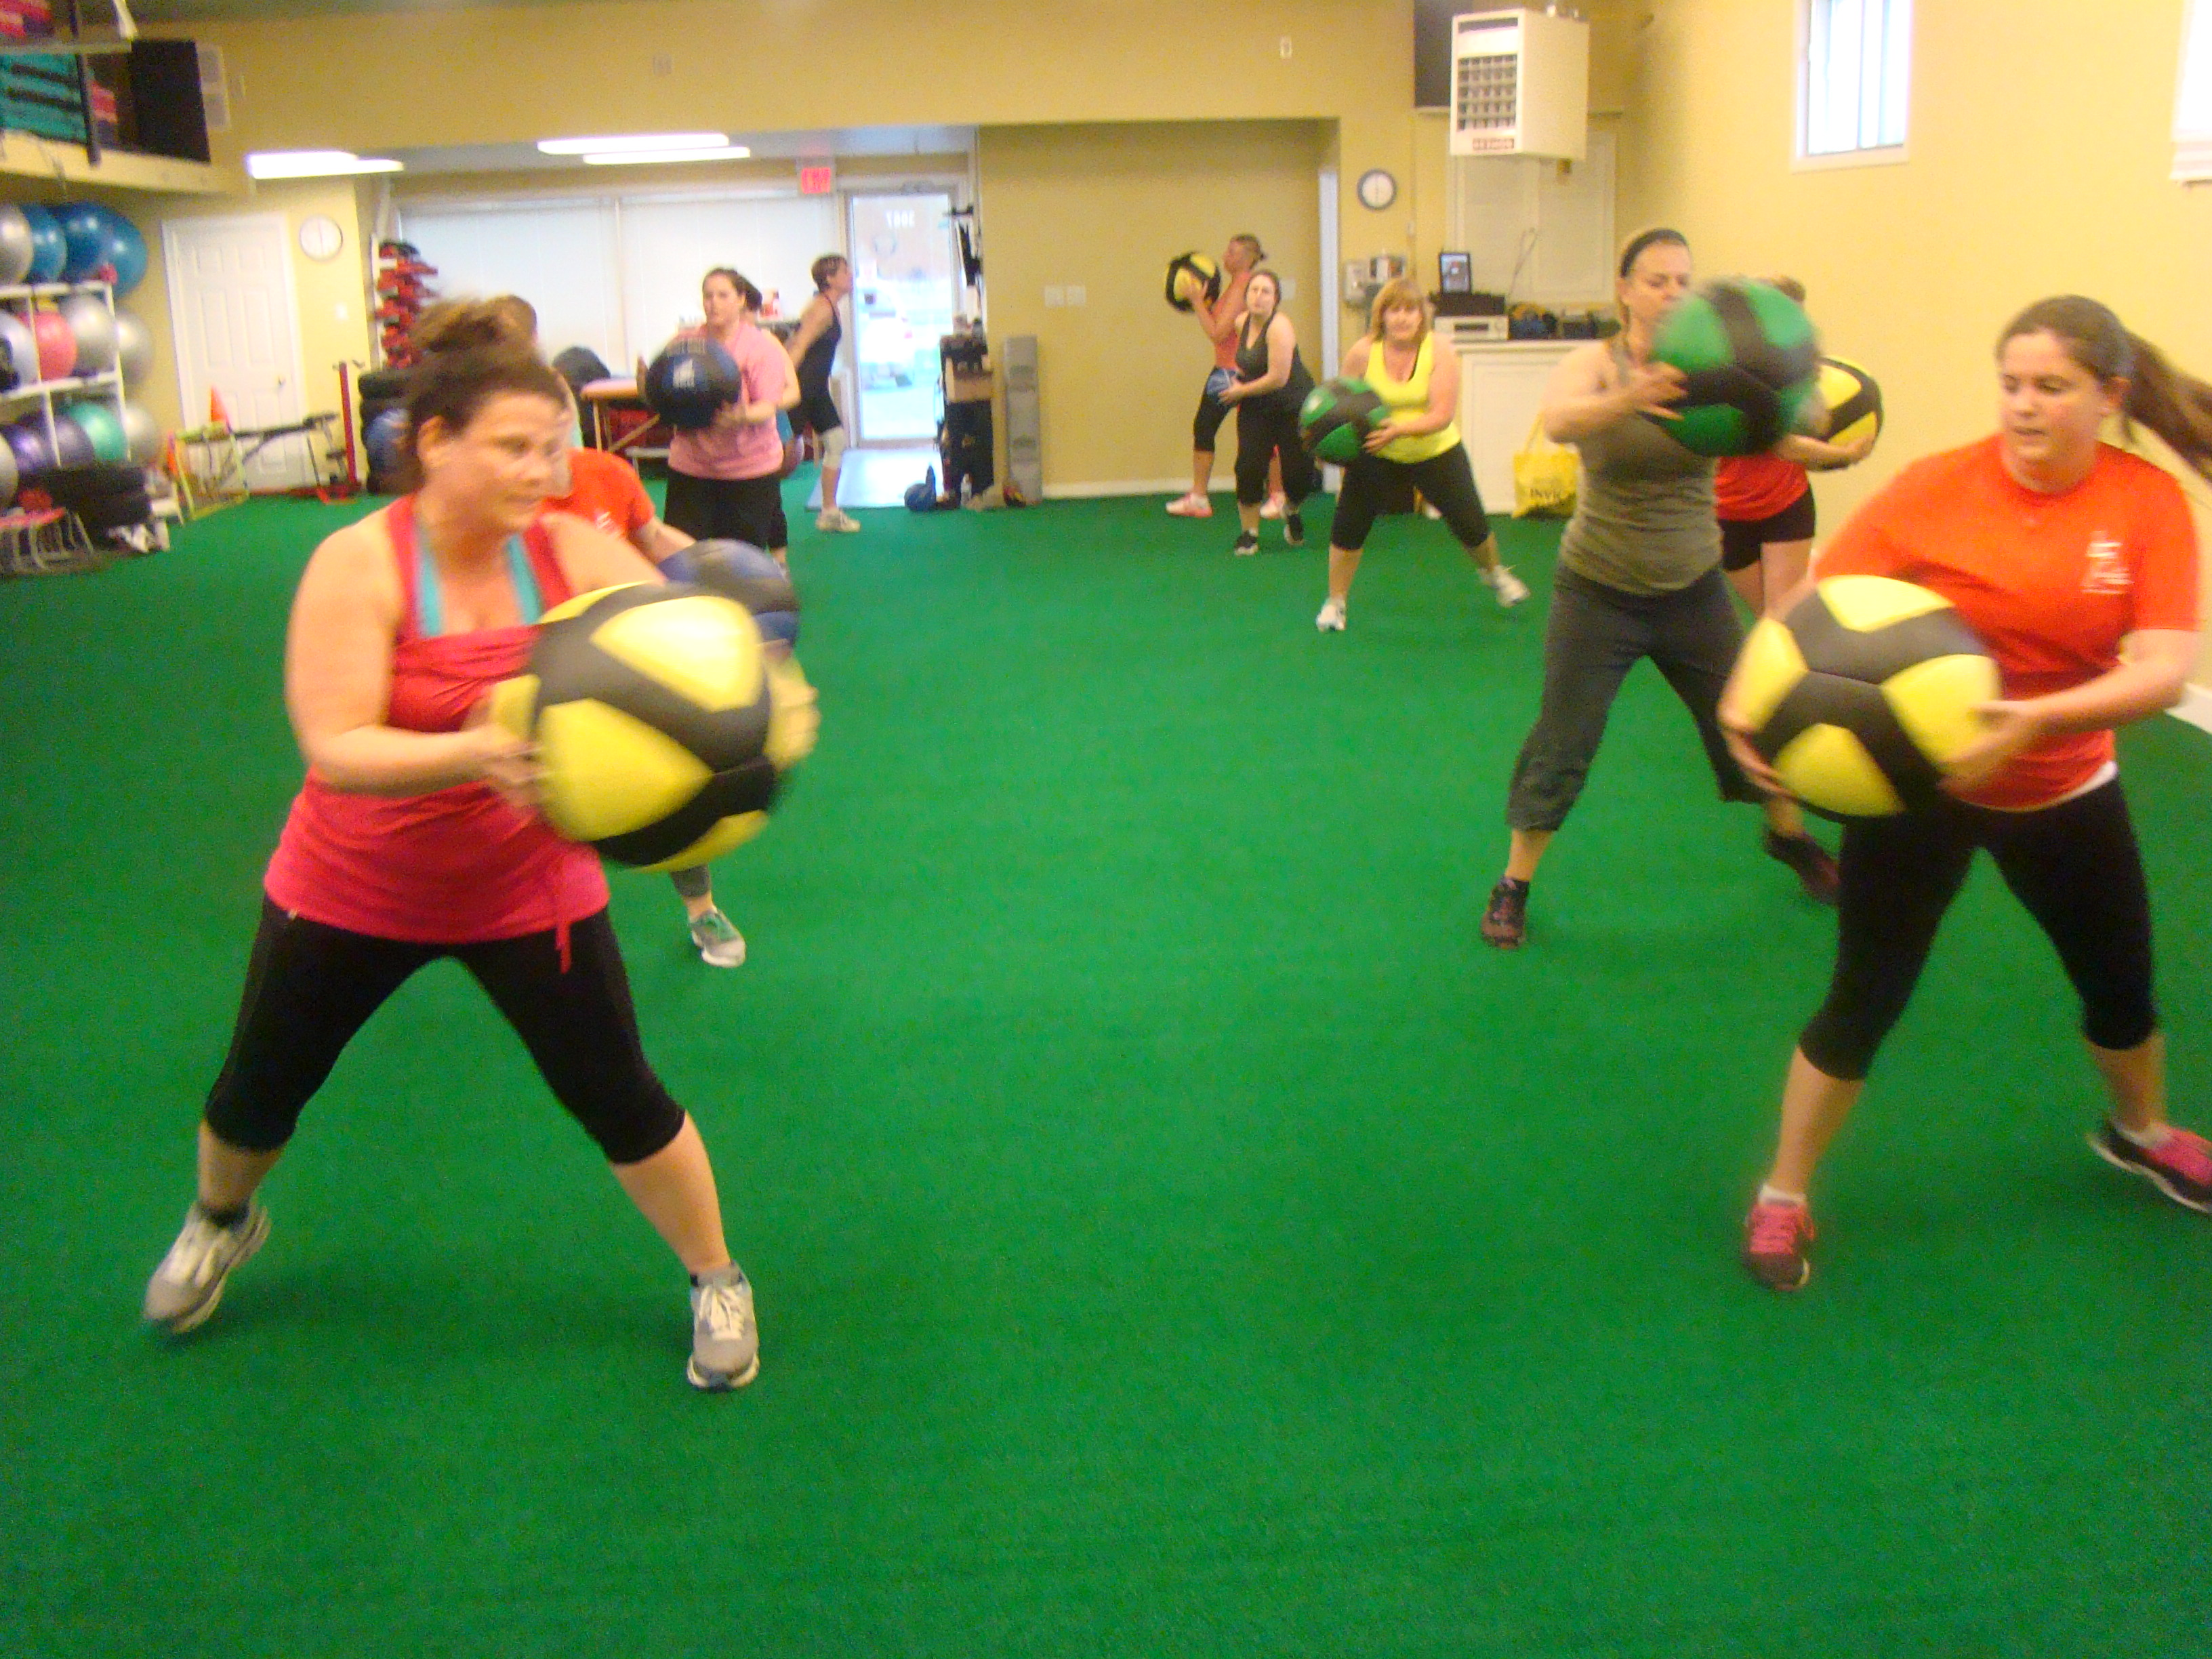 Kickboxing Body Workout Dsc